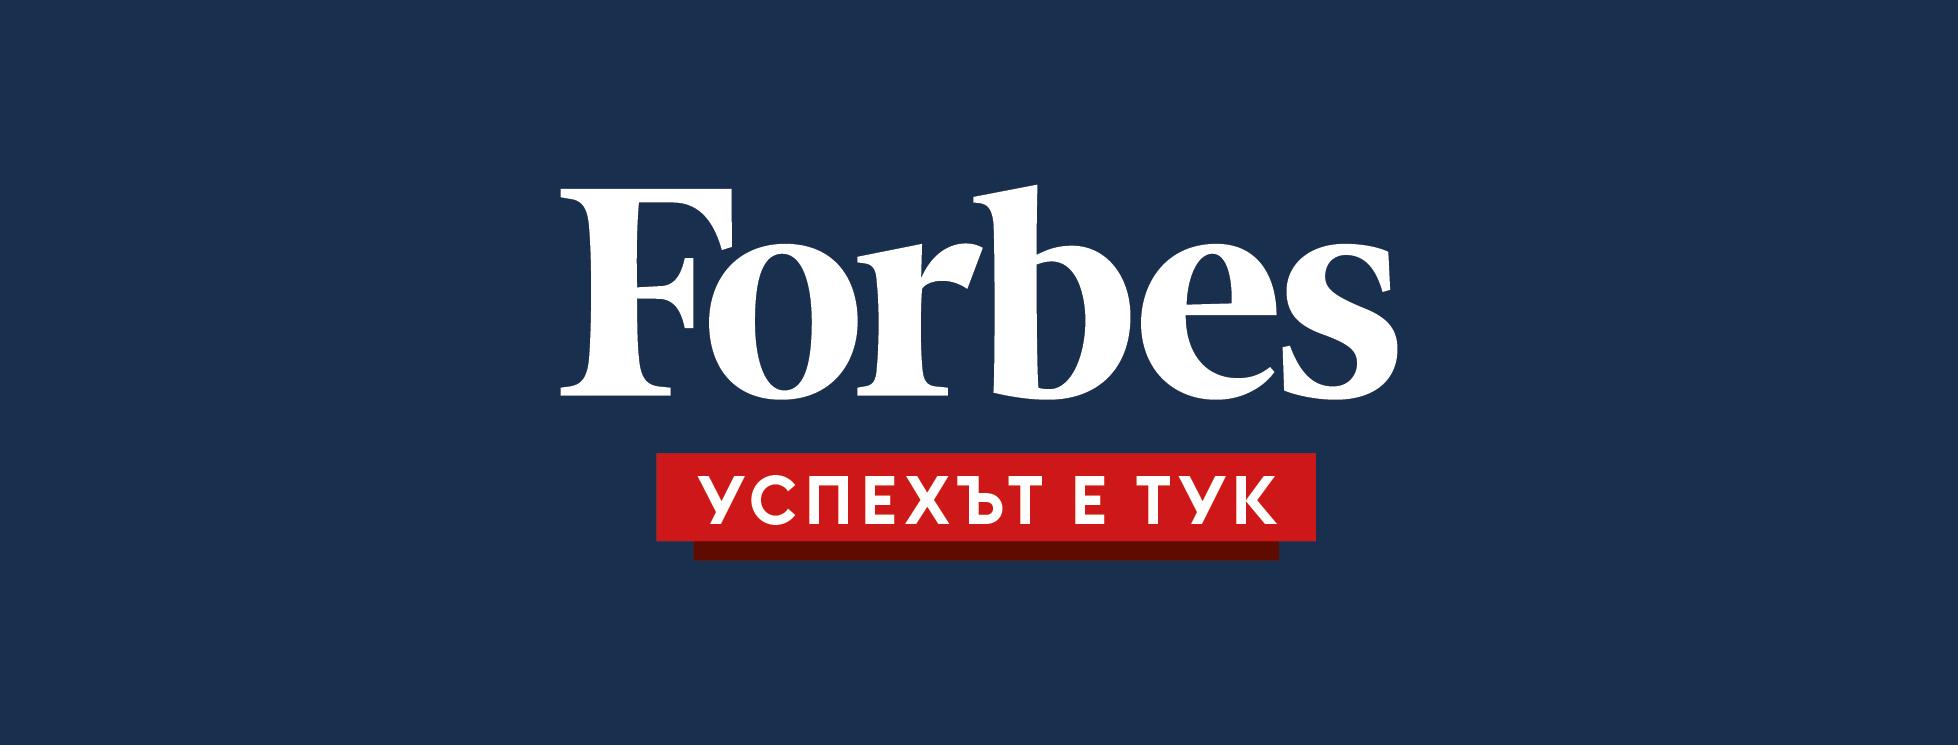 Финалистите във FORBES Business Awards 2020